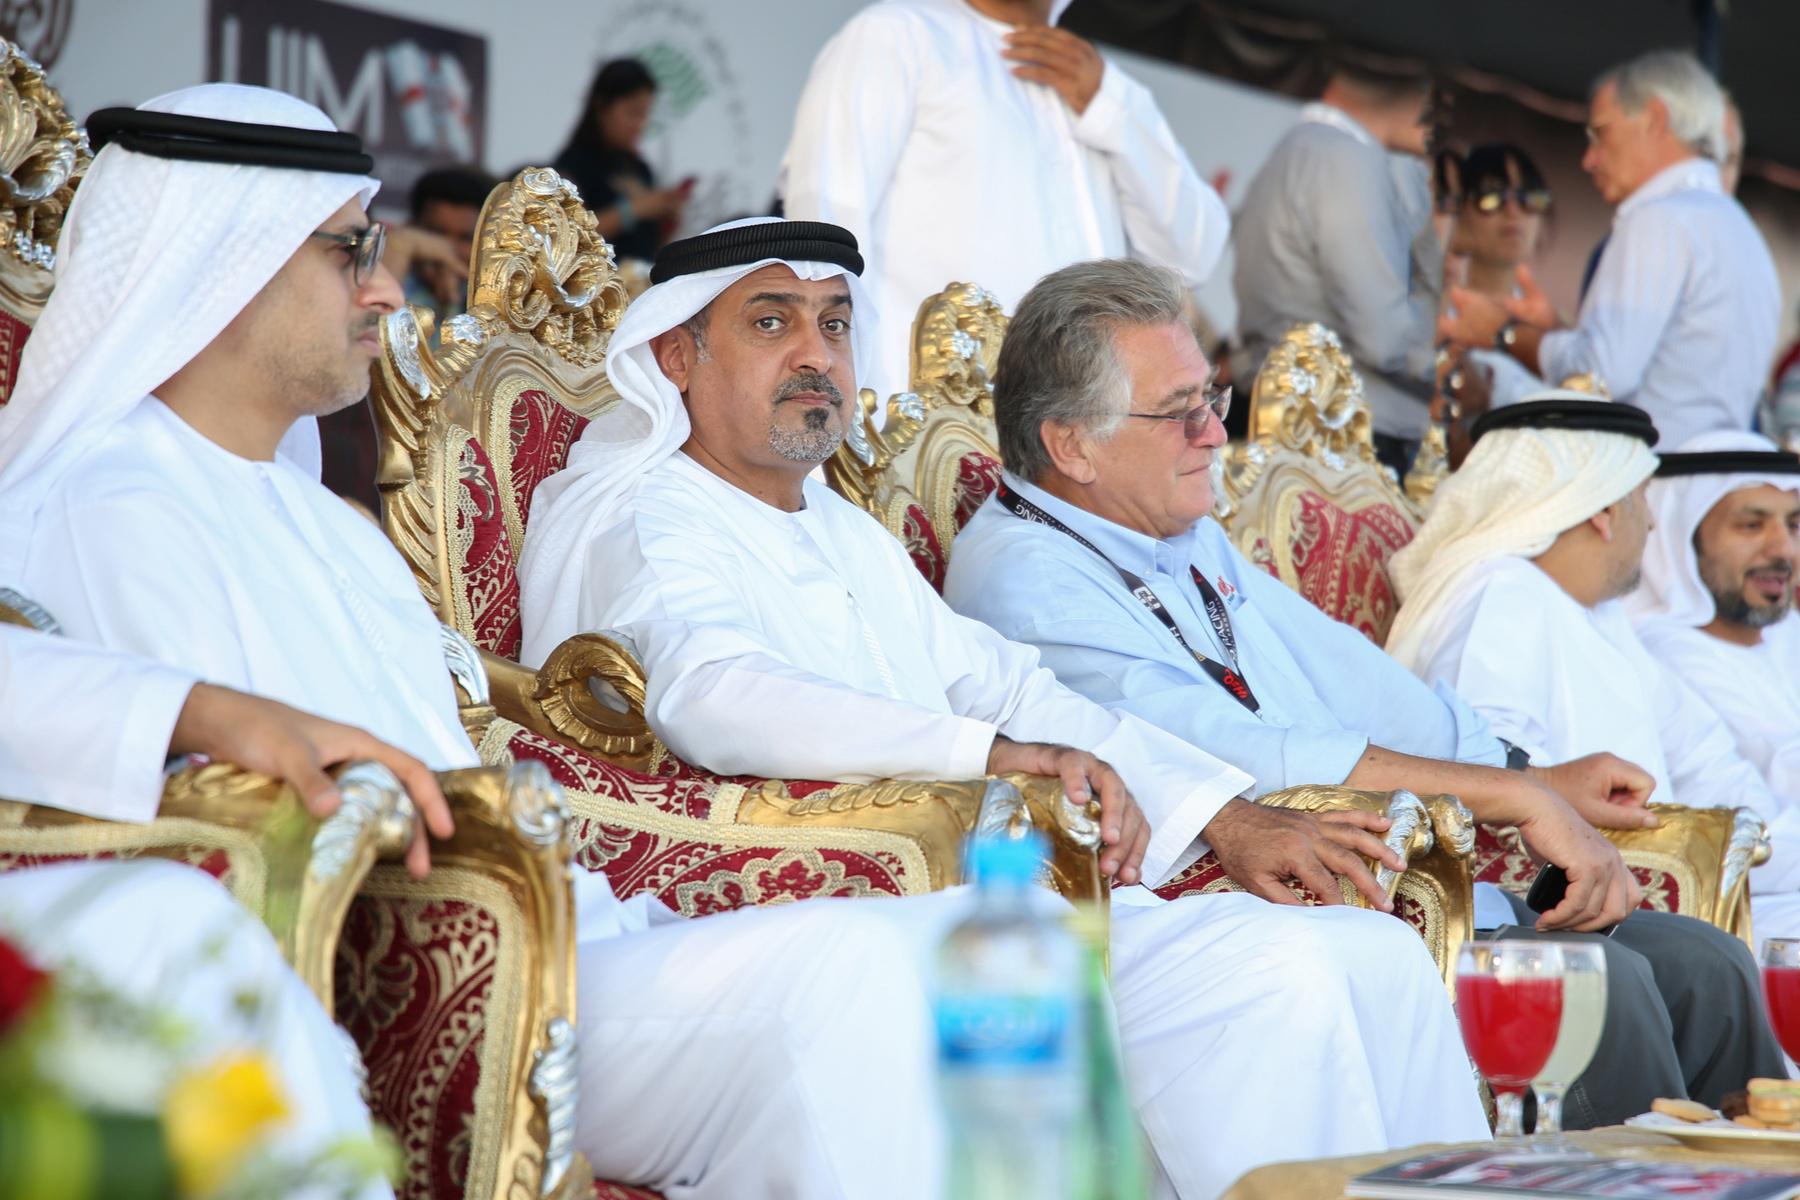 UAE President Khalifa bin Zayed al Nahyan